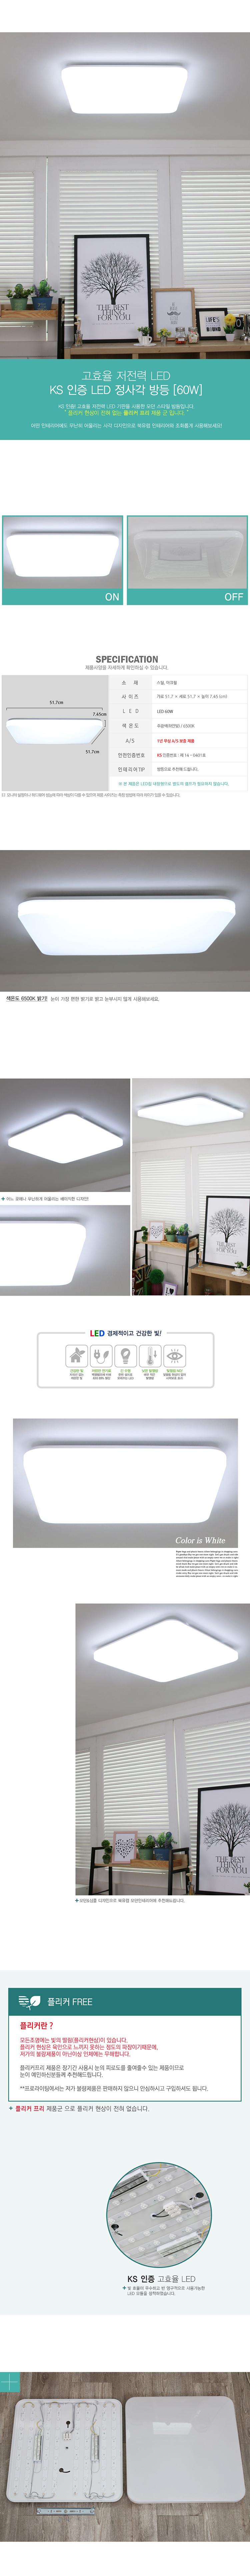 LED 아레스 정사각 방등 60W.jpg